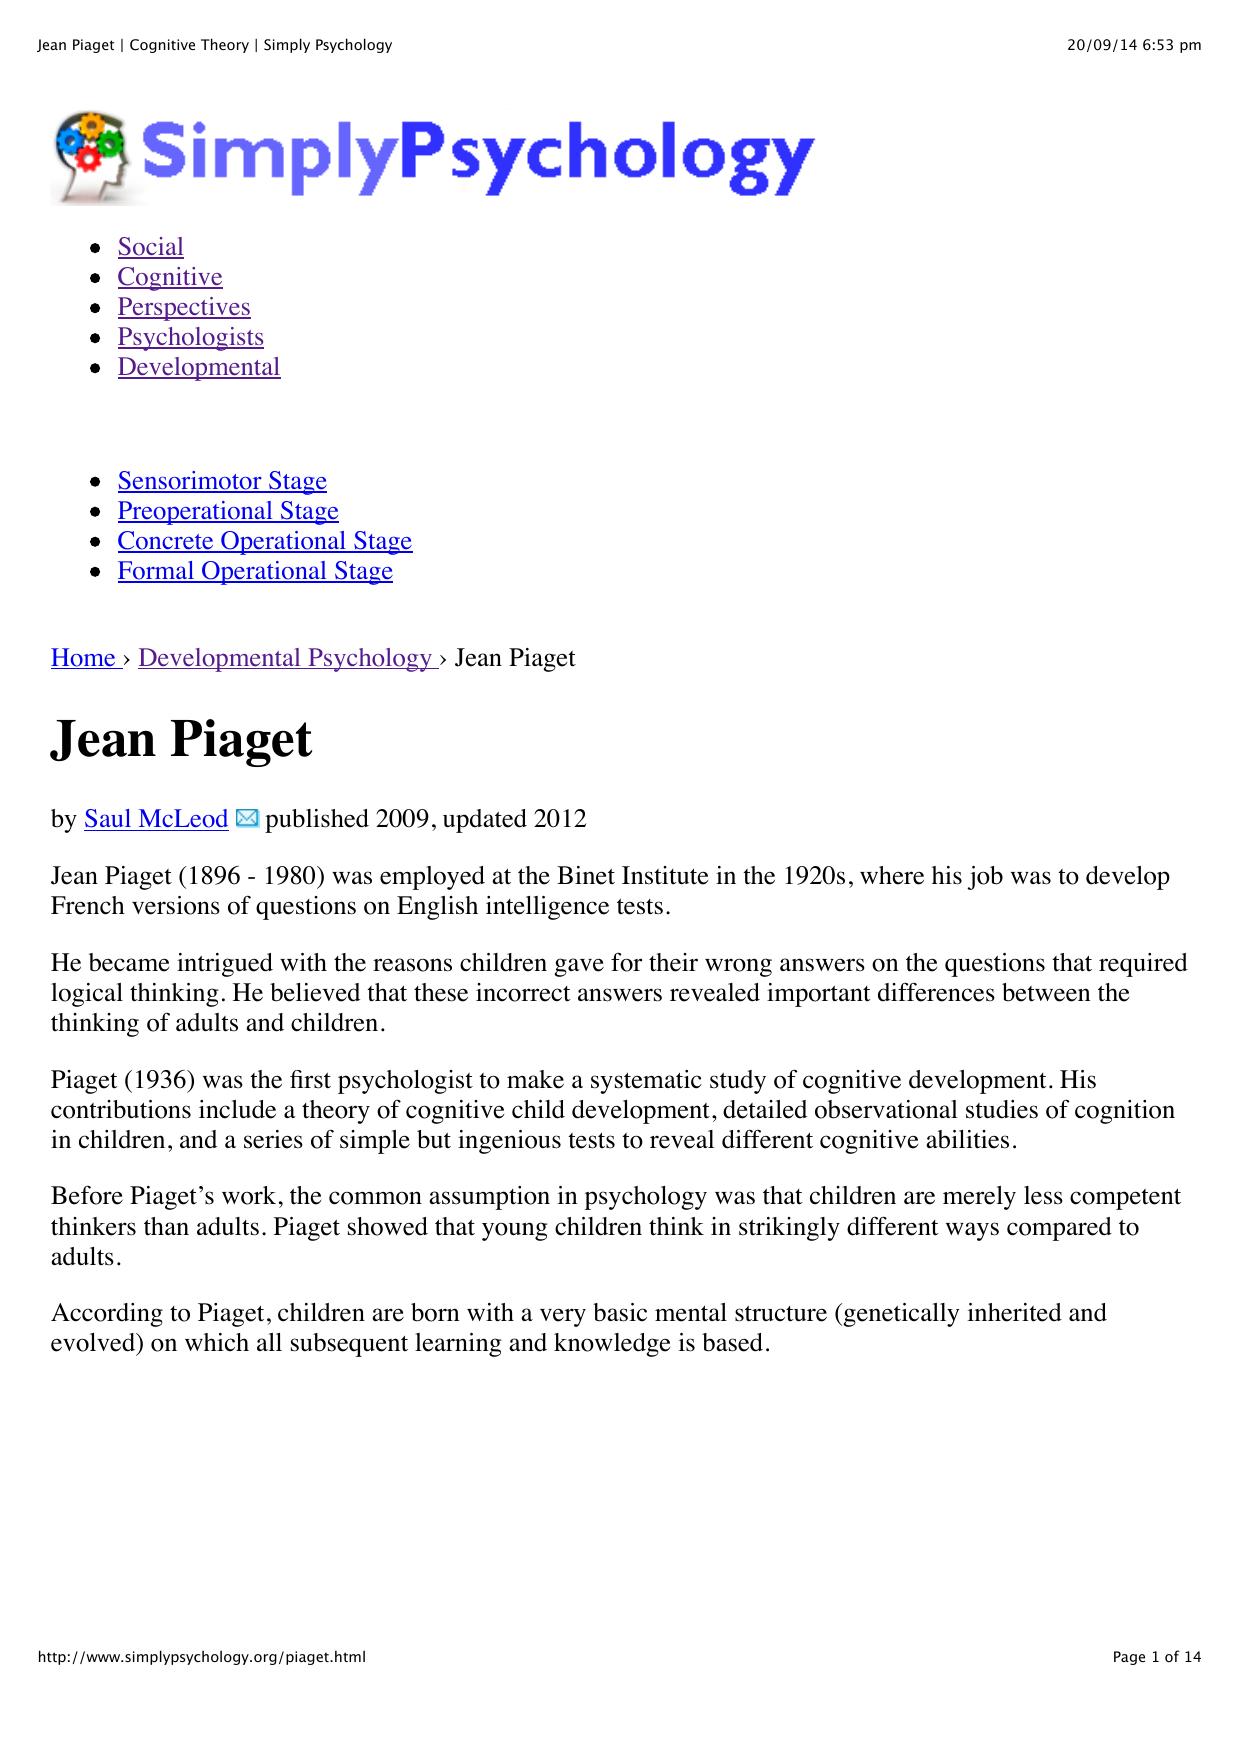 jean piaget works